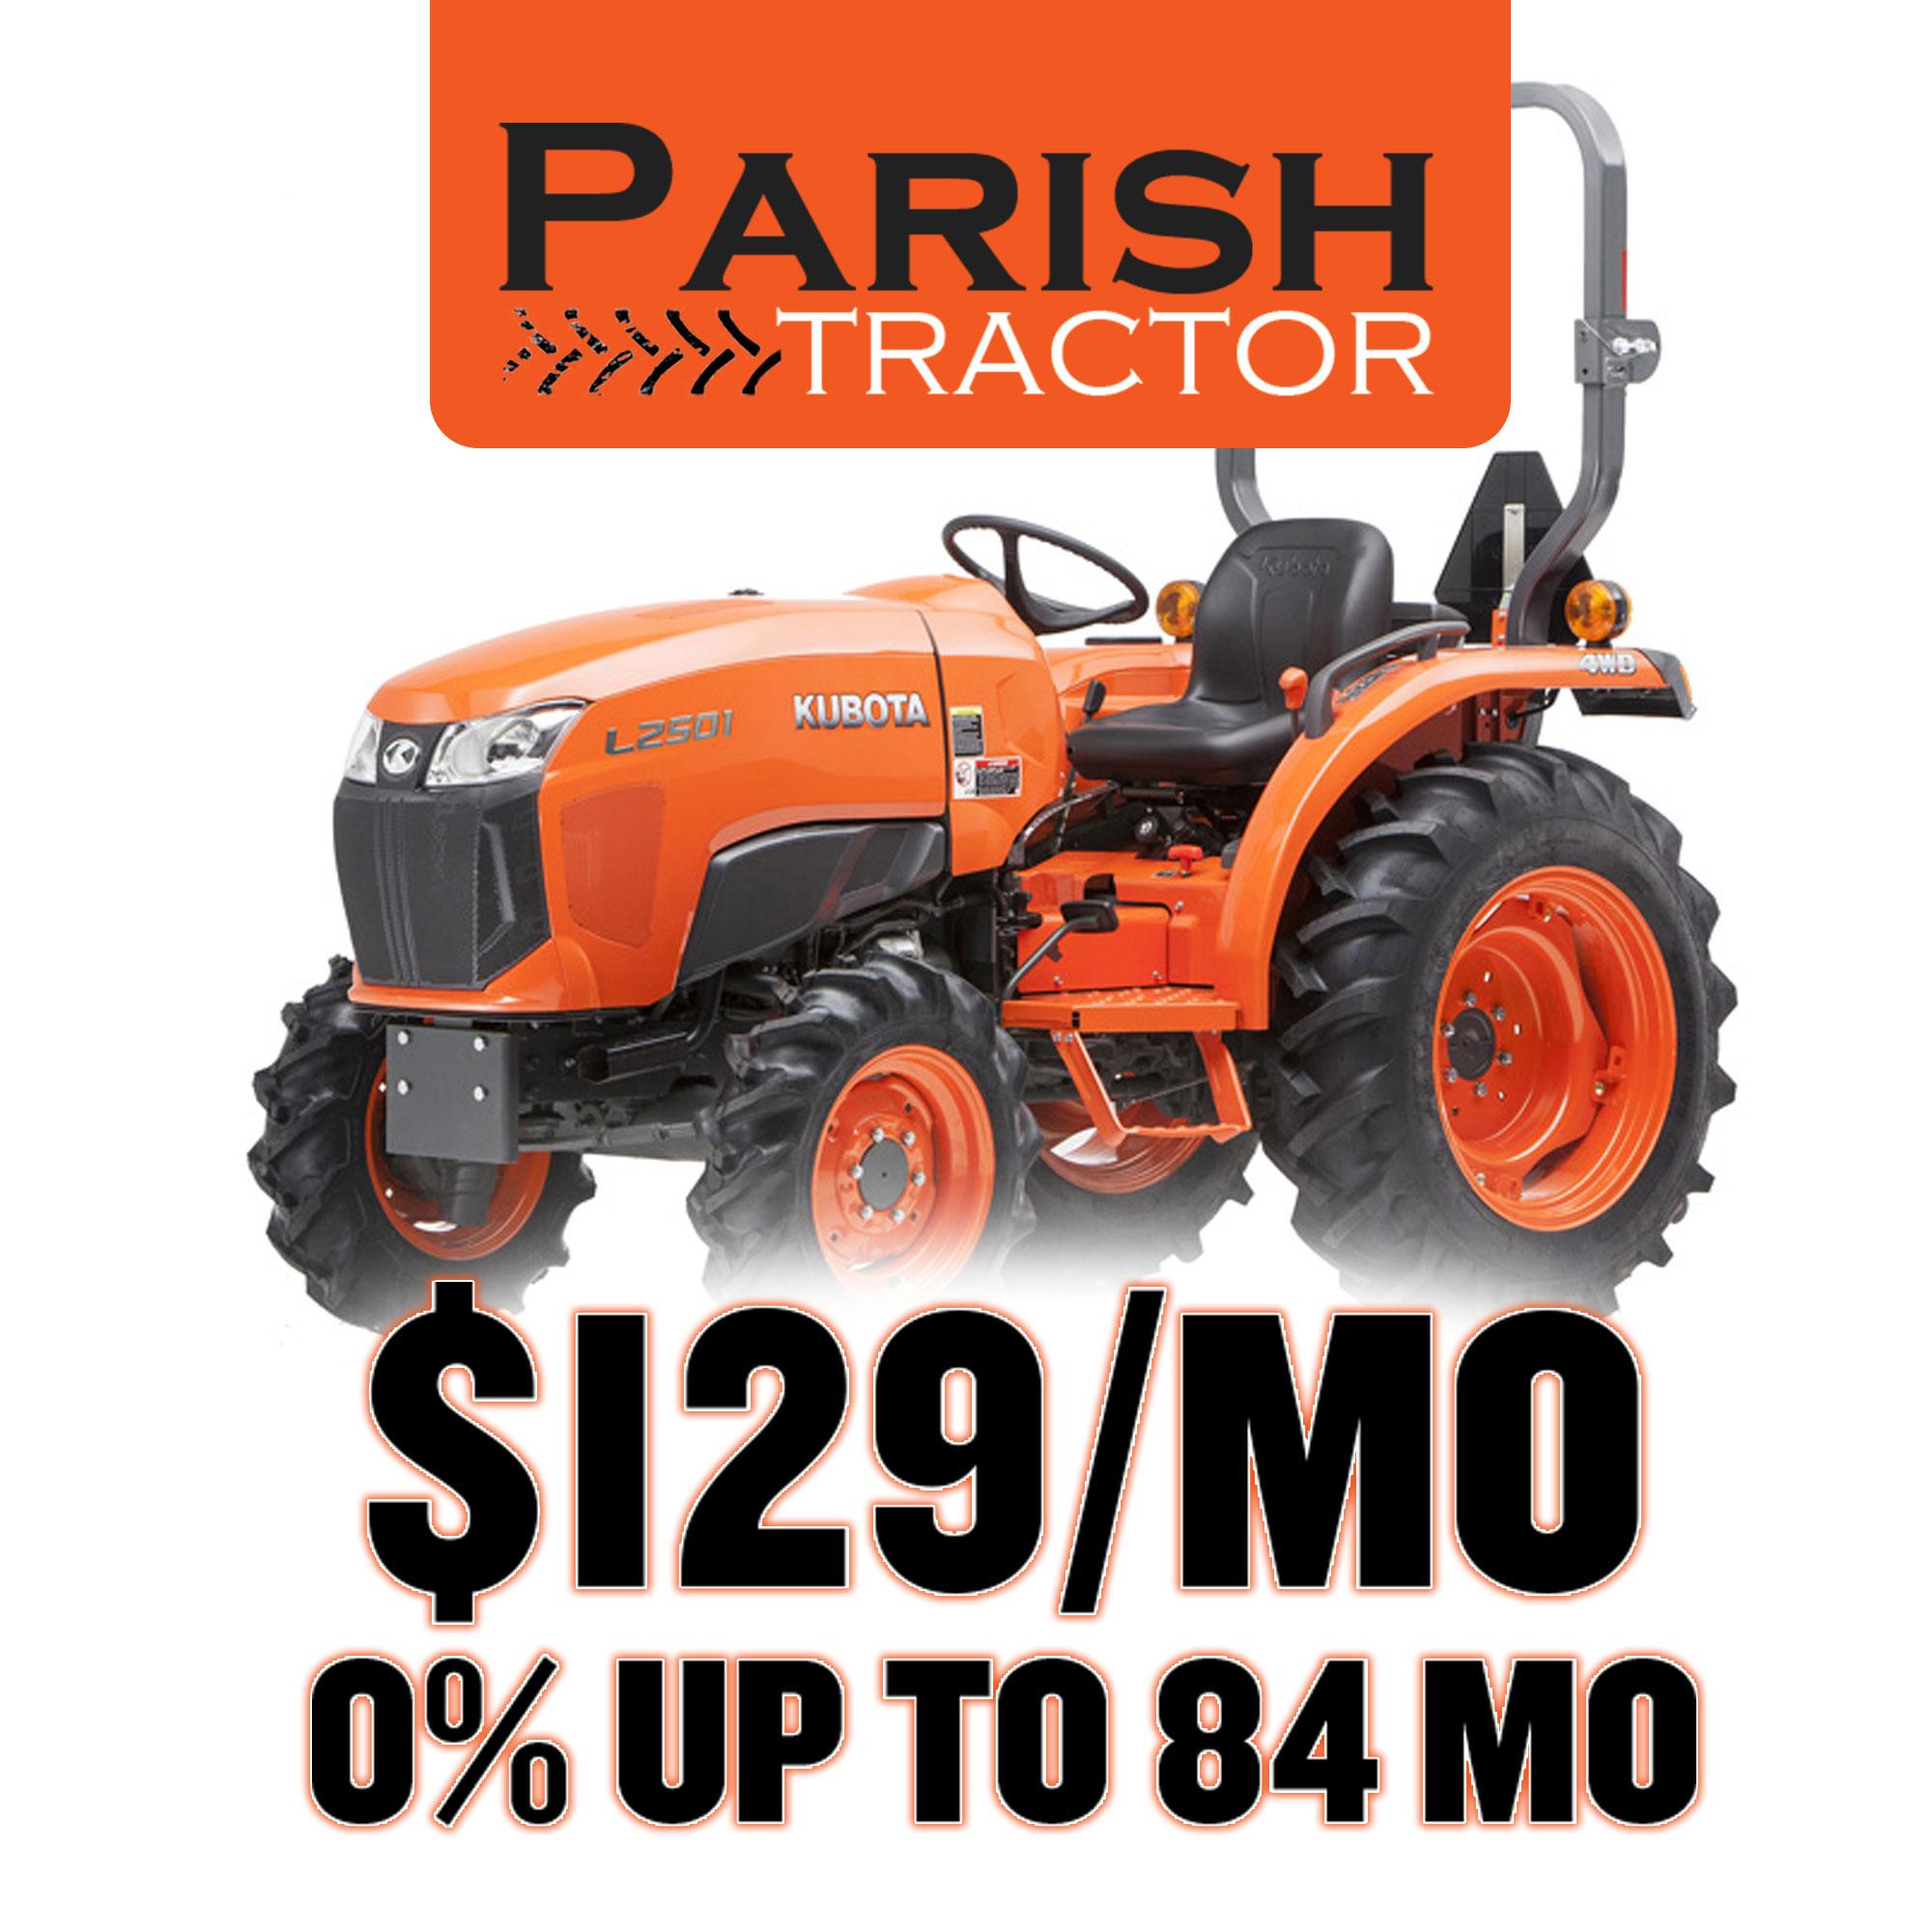 TV Commercial: Parish Tractor Kubota Dealership